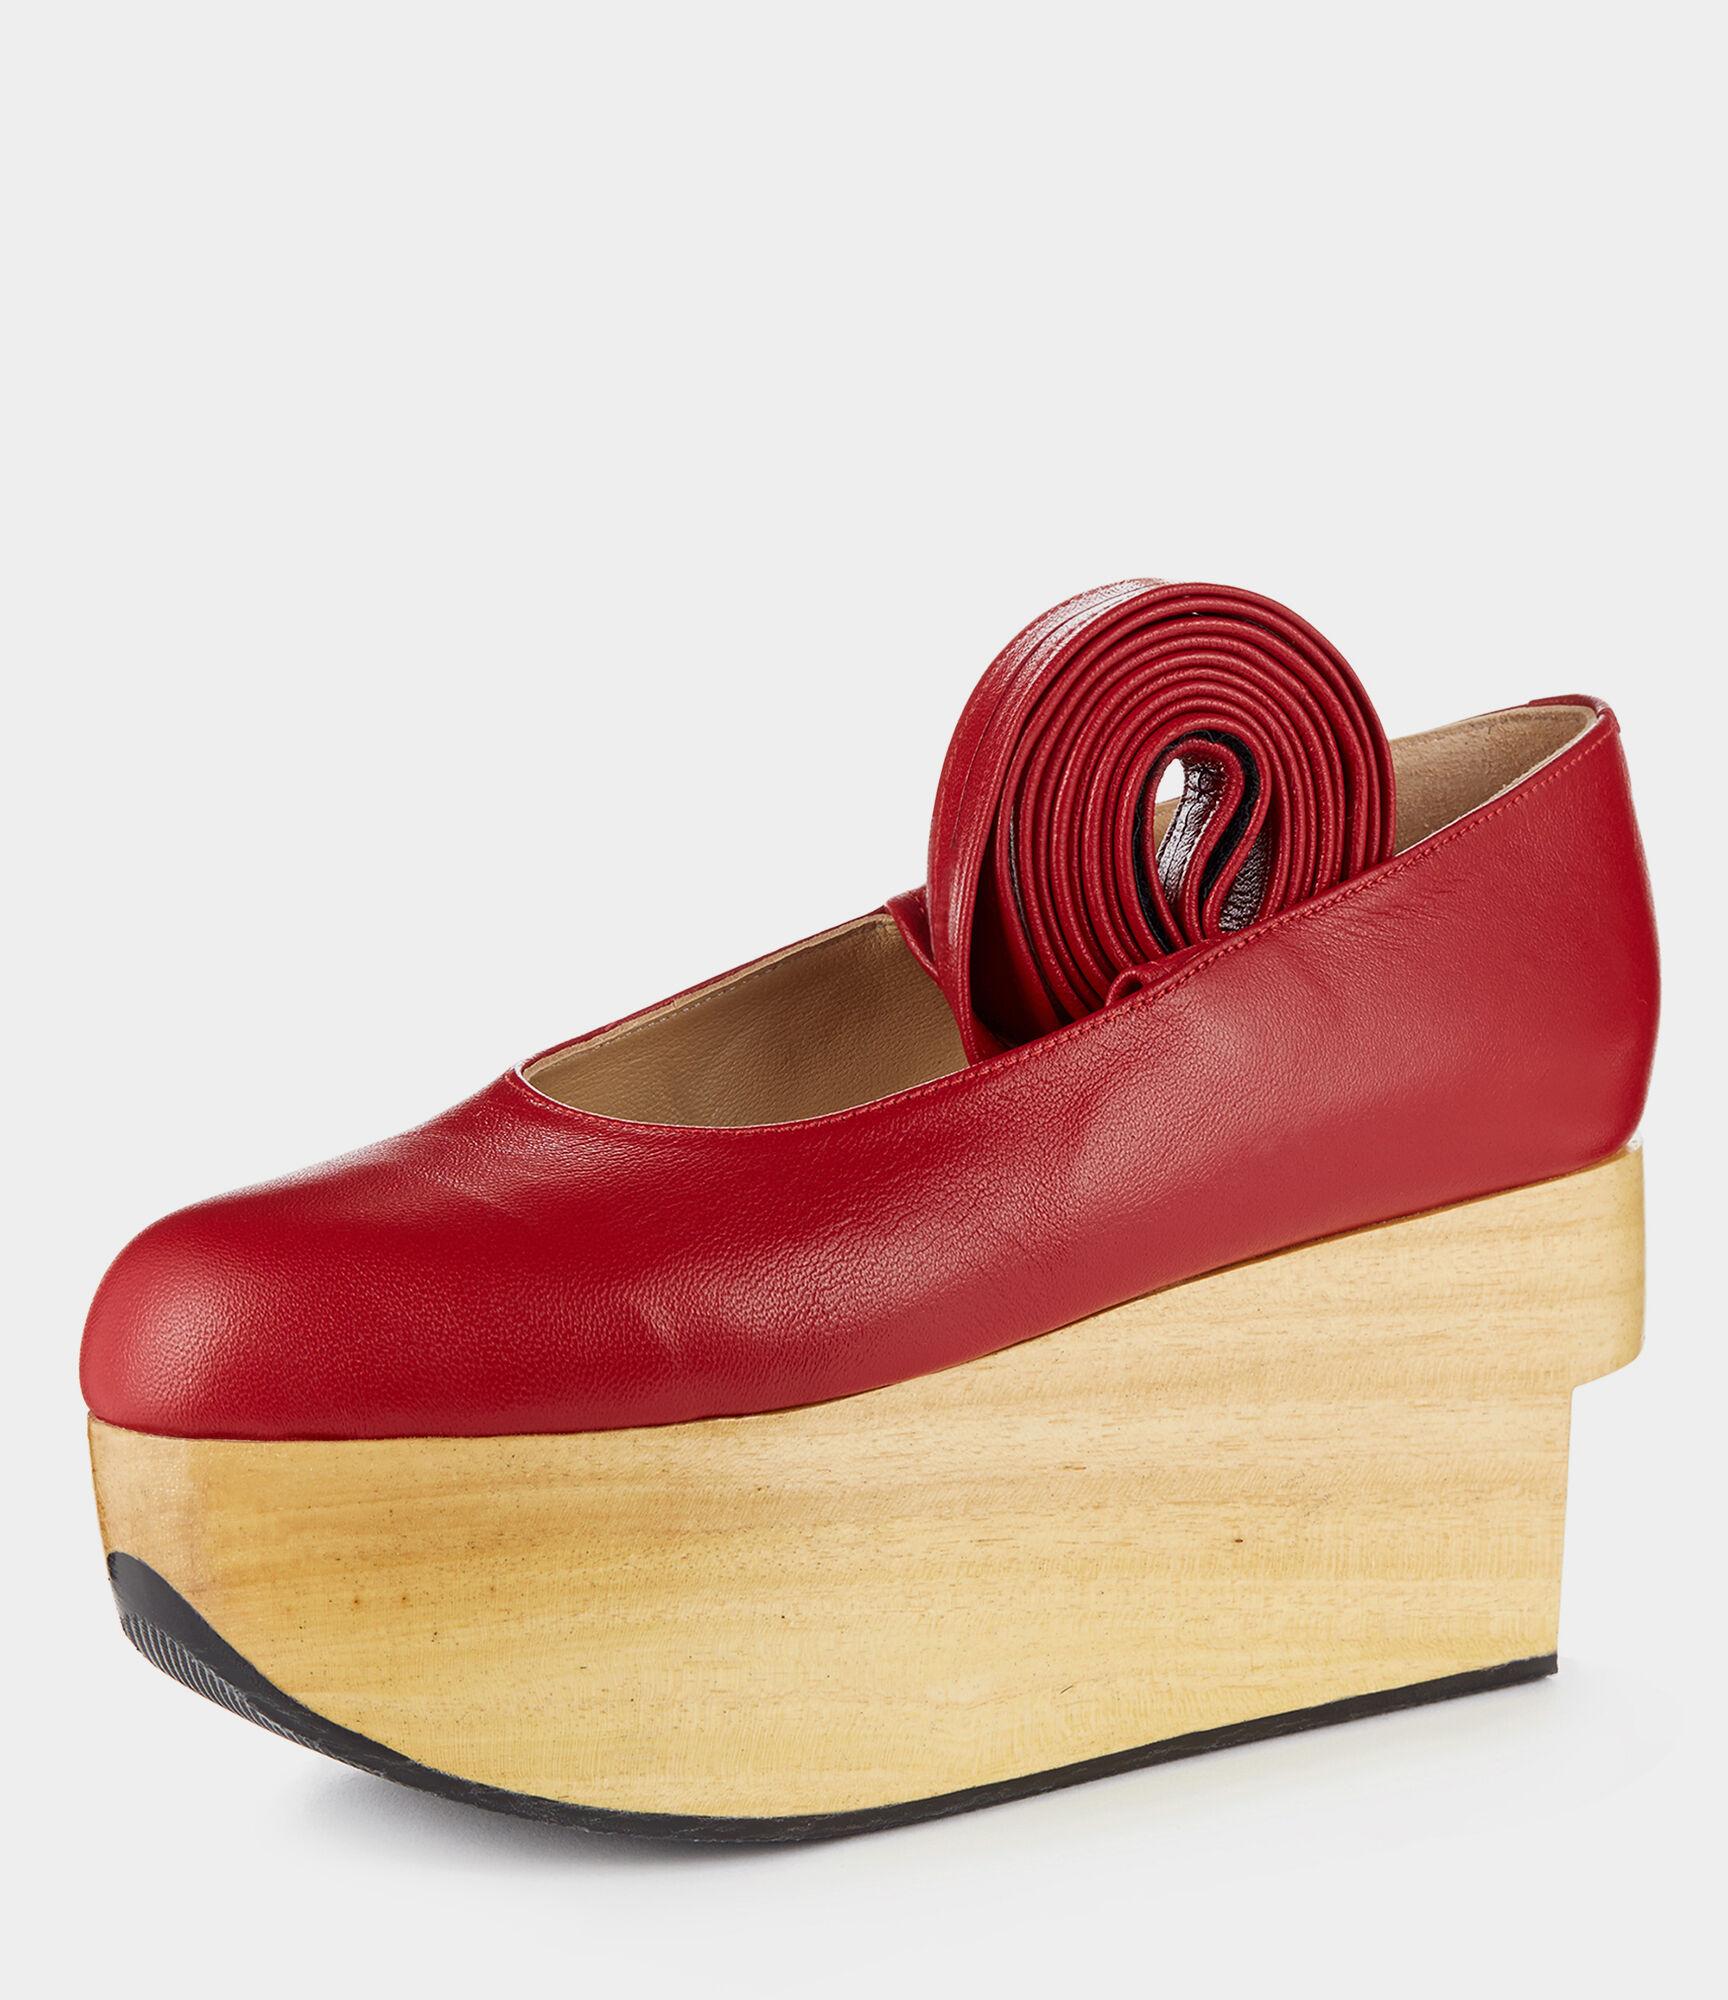 Rocking Horse Ballerina | Women's Shoes